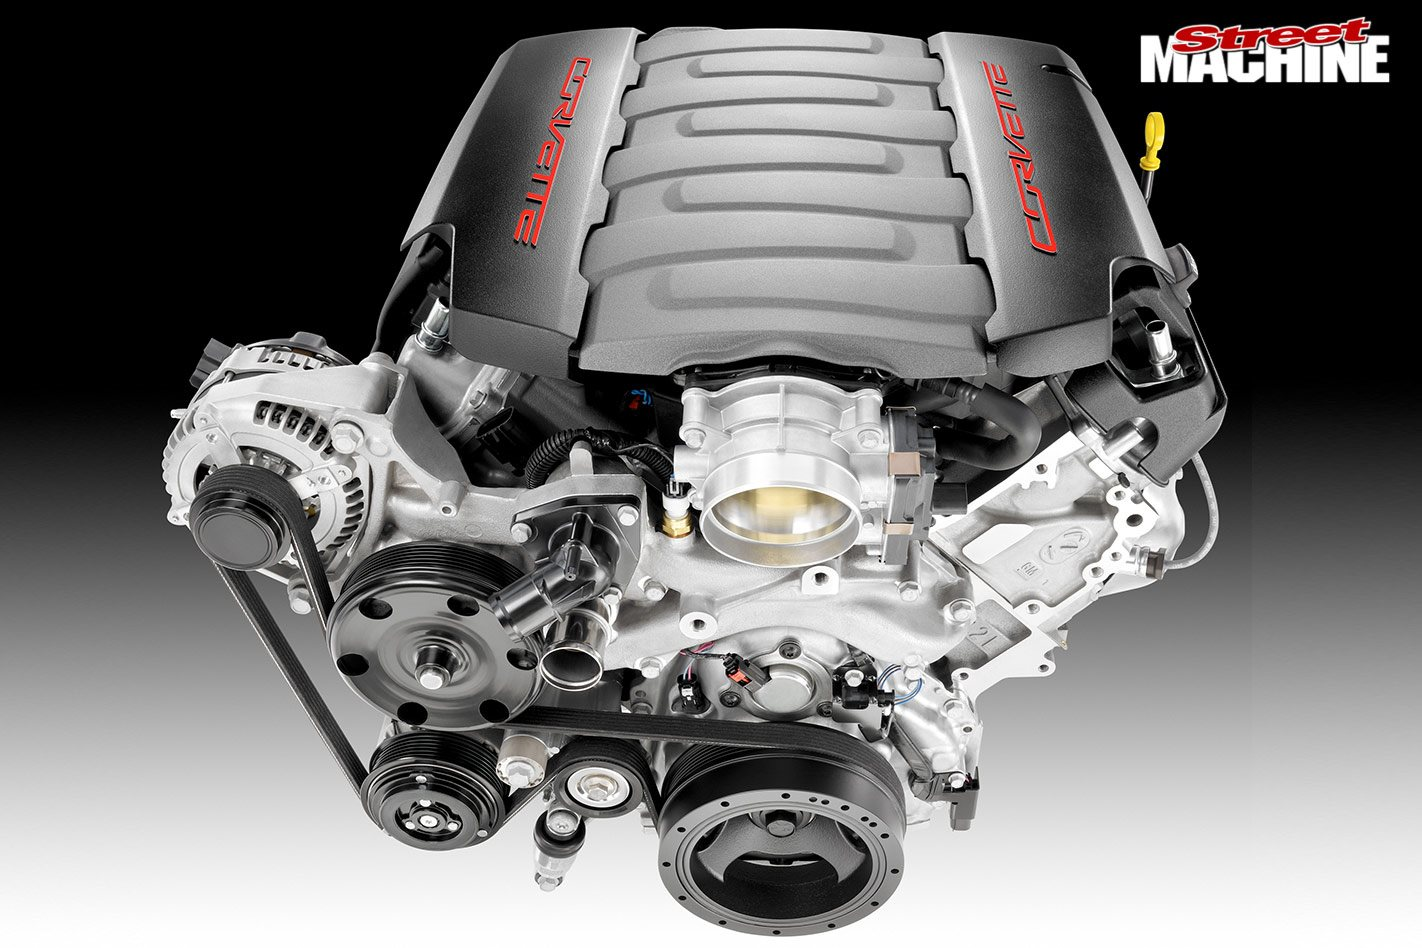 gm l8t engine